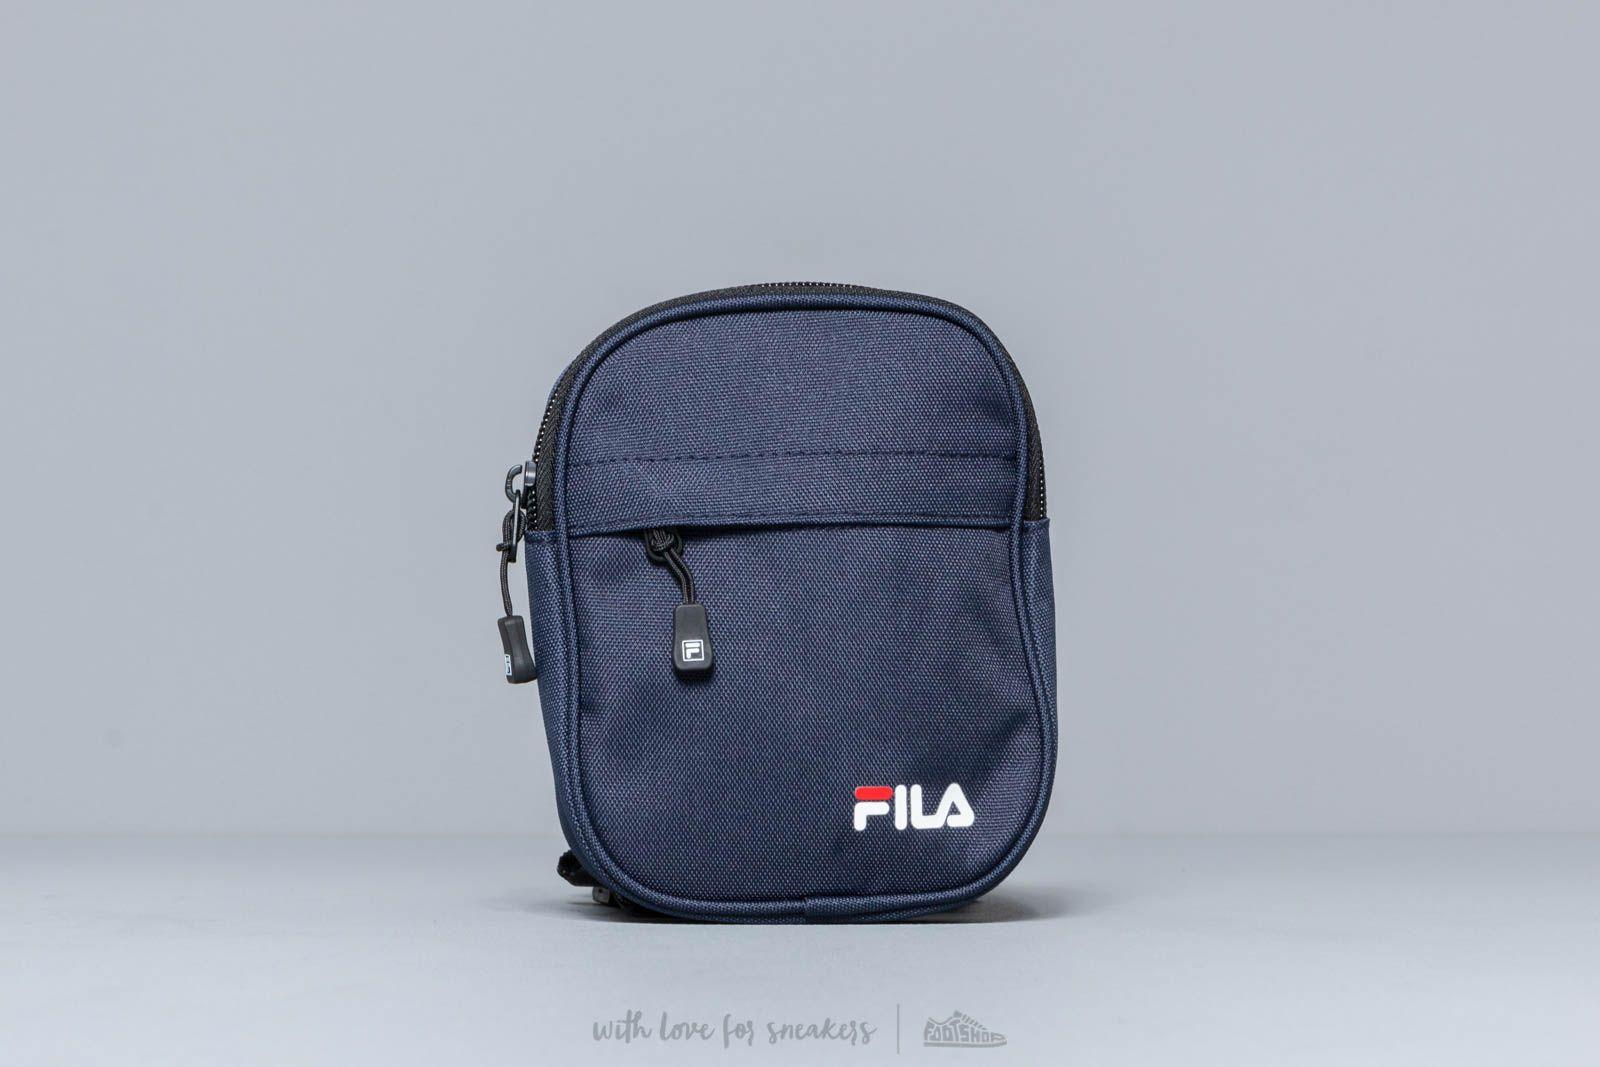 FILA New Pusher Berlin Bag